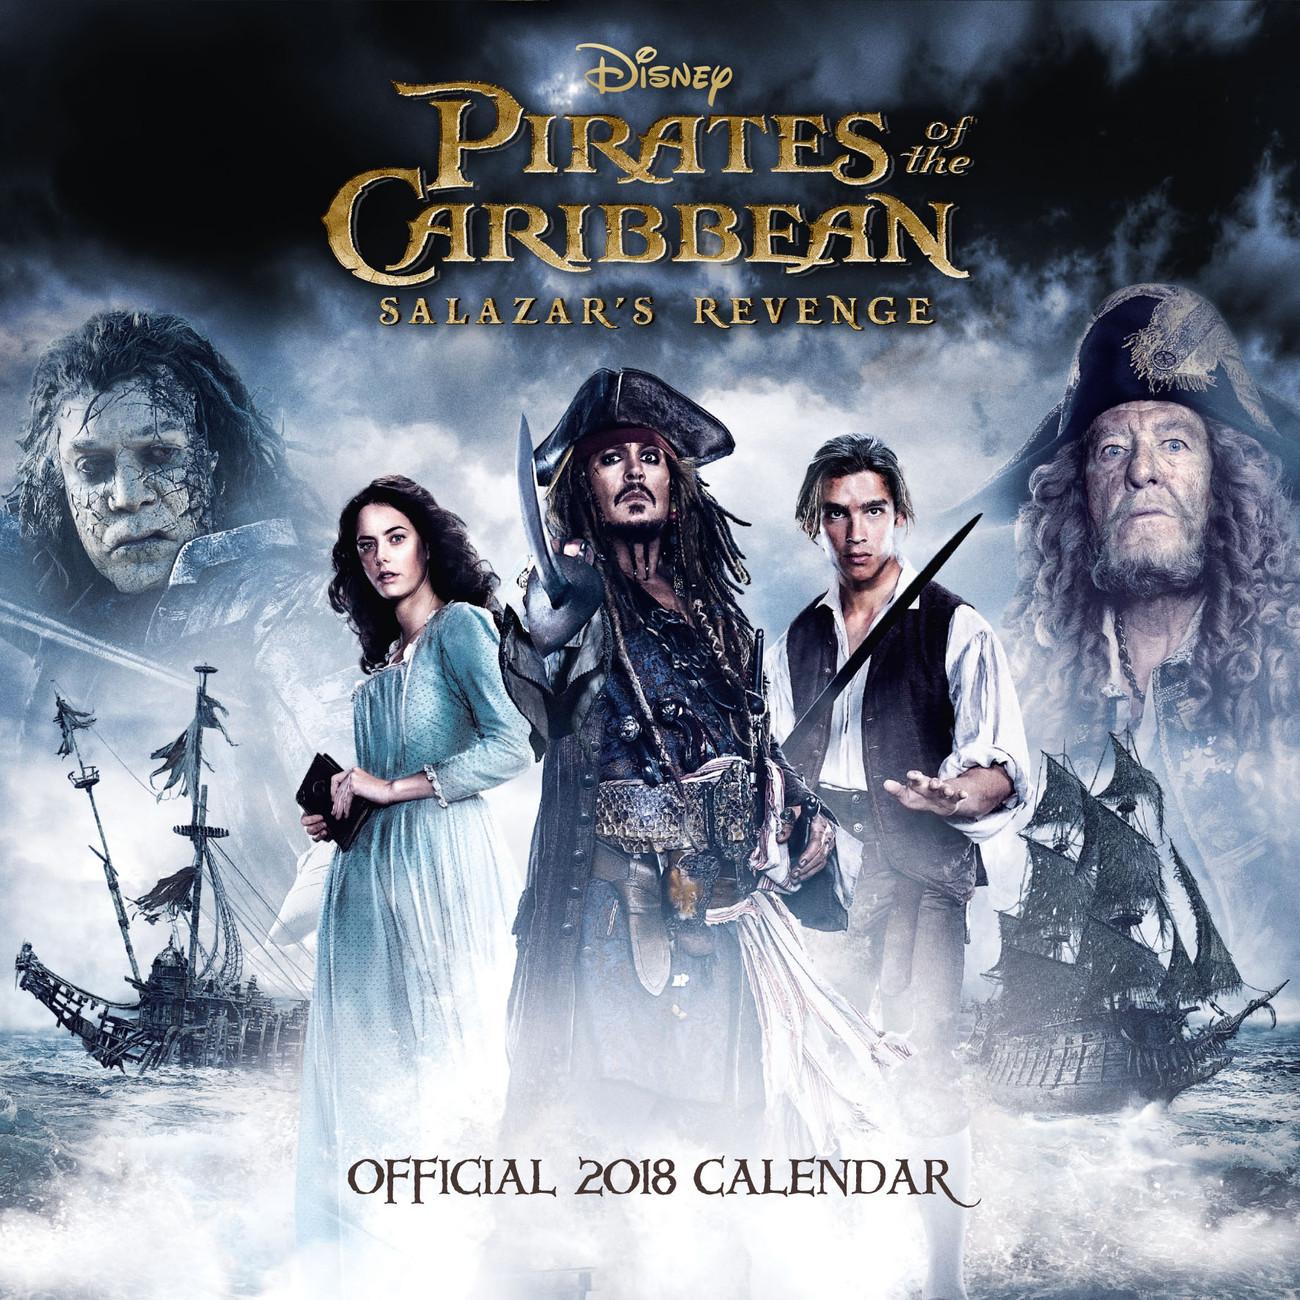 Piratas del Caribe - Calendarios 2018